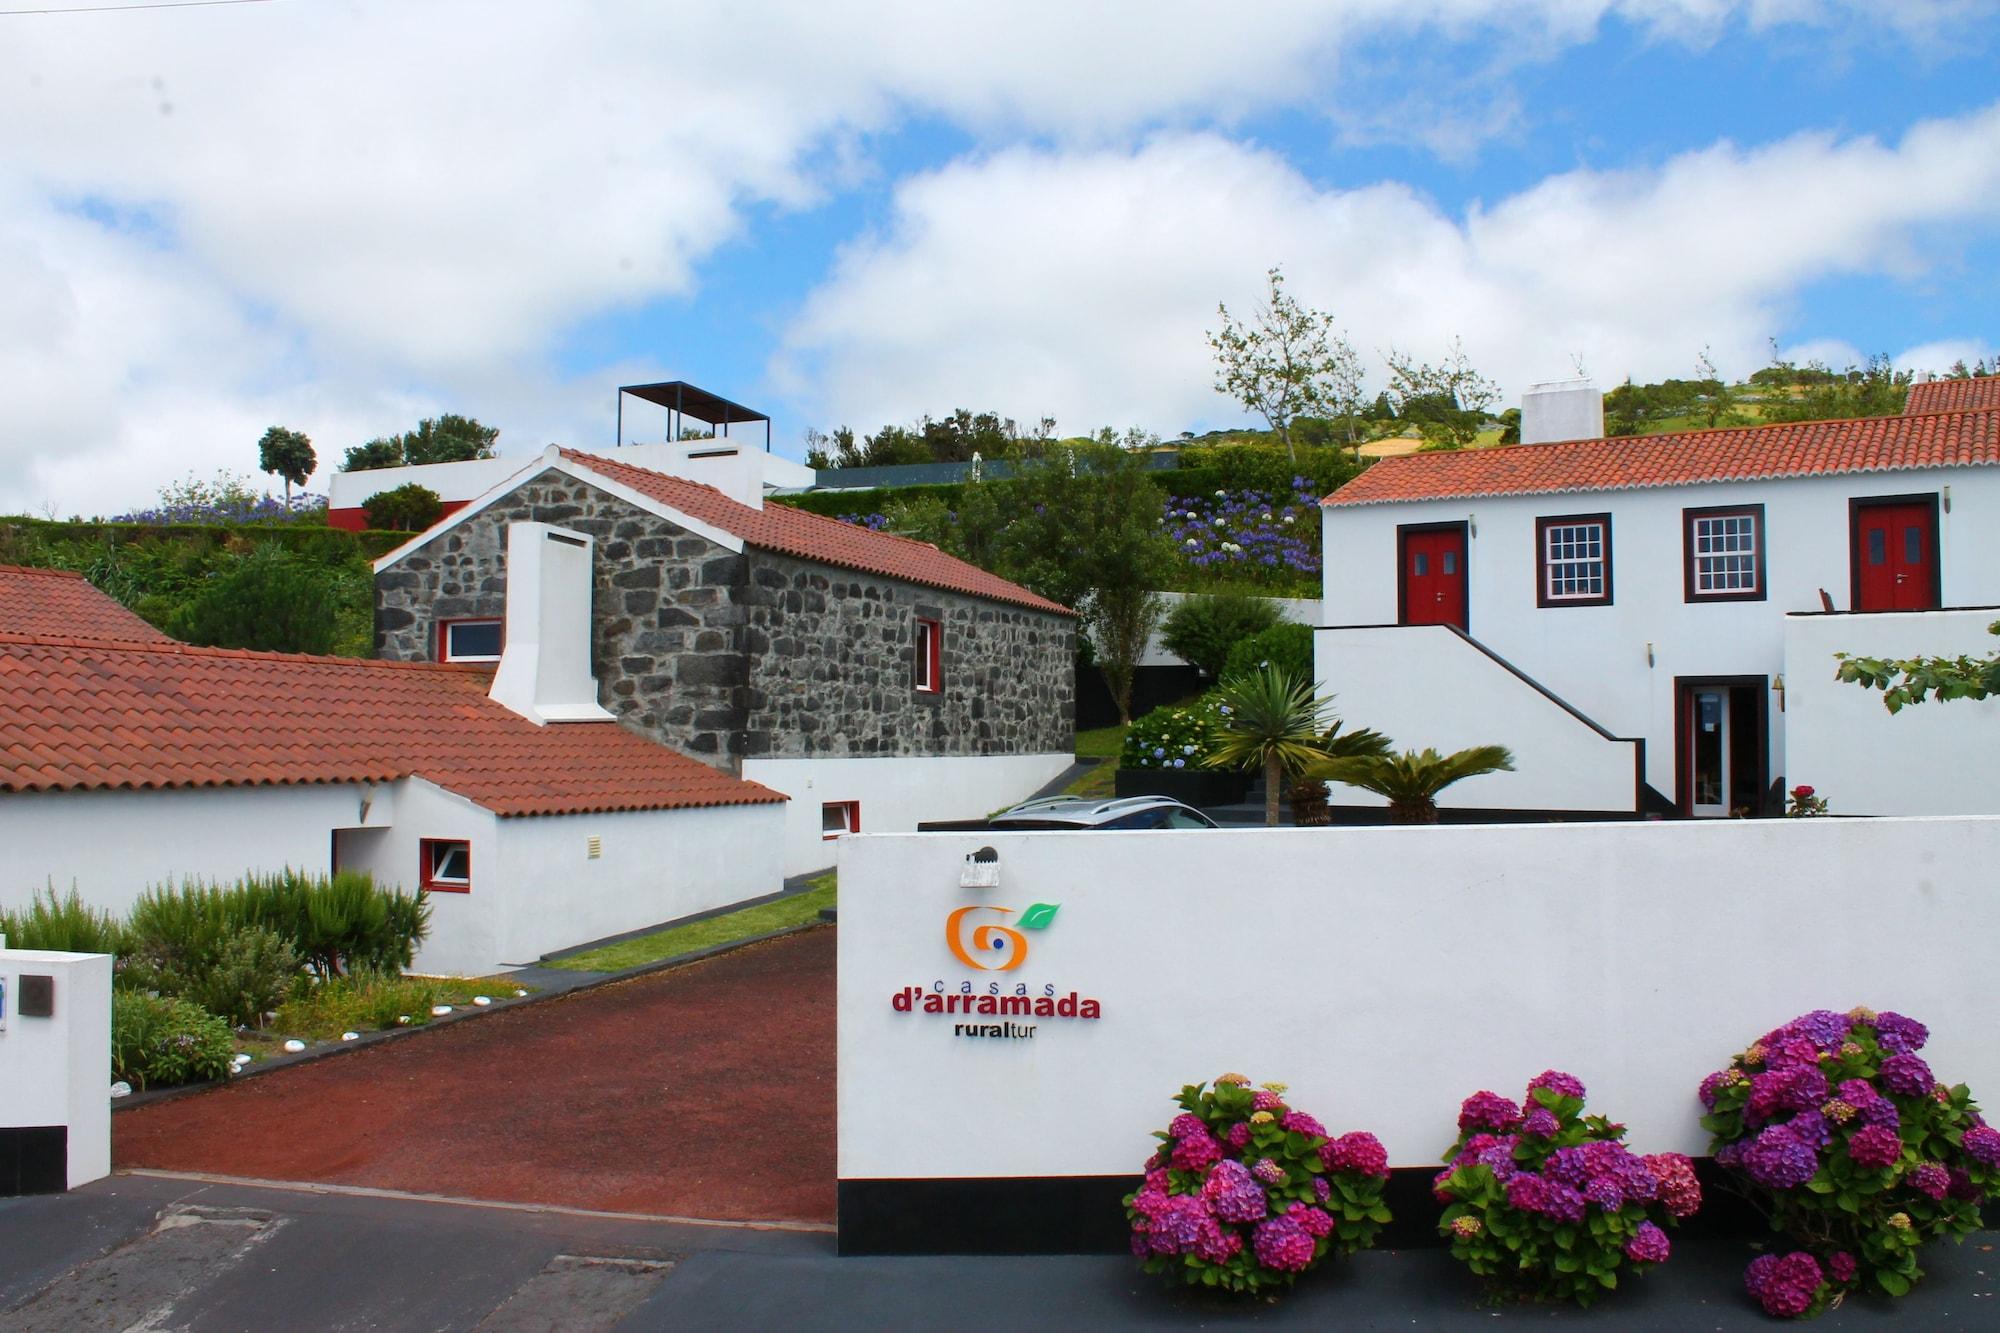 Casas D'Arramada - Rural Tourism, Horta